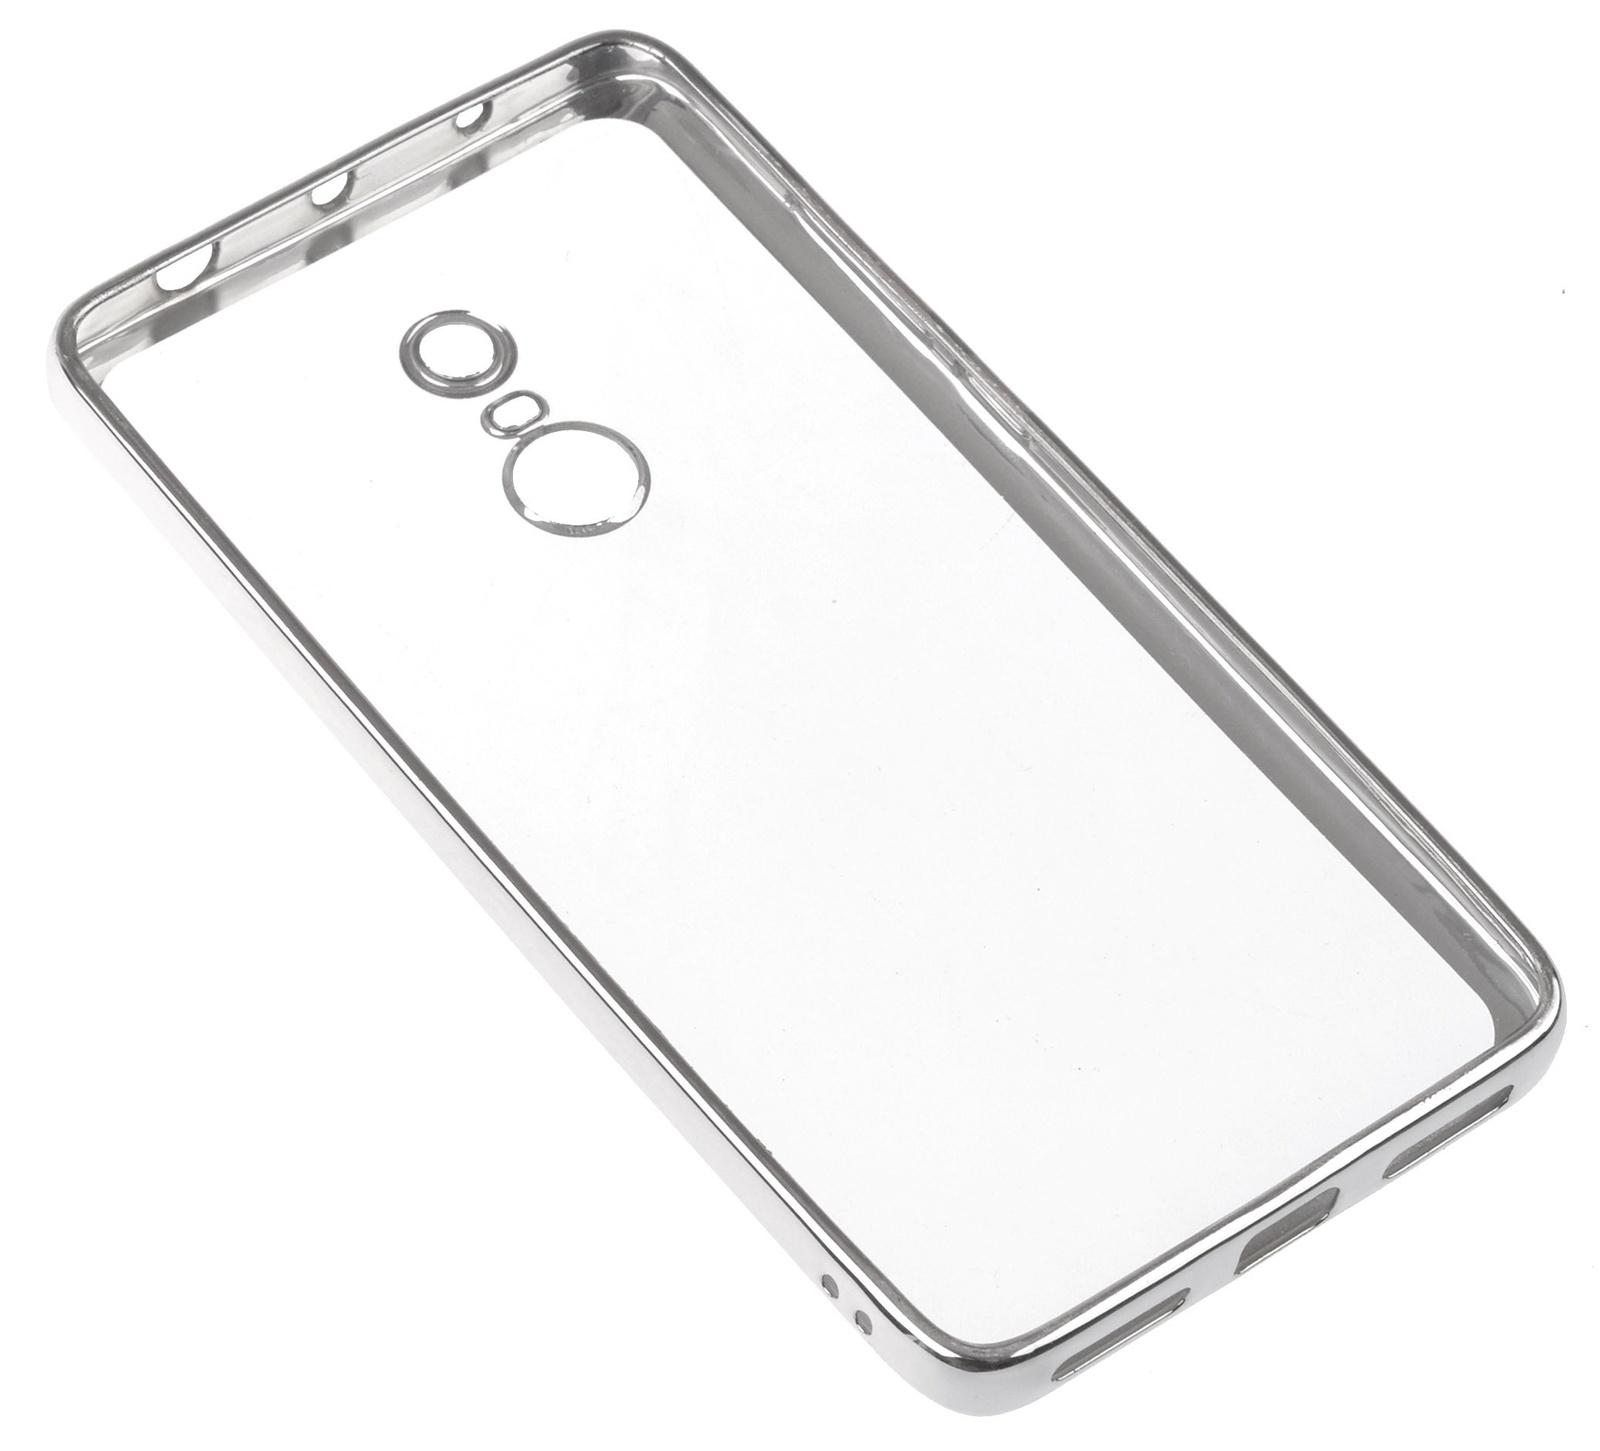 Чехол для сотового телефона skinBOX Silicone chrome border, 4630042520899, серебристый чехол для сотового телефона skinbox silicone chrome border 4630042528697 серебристый